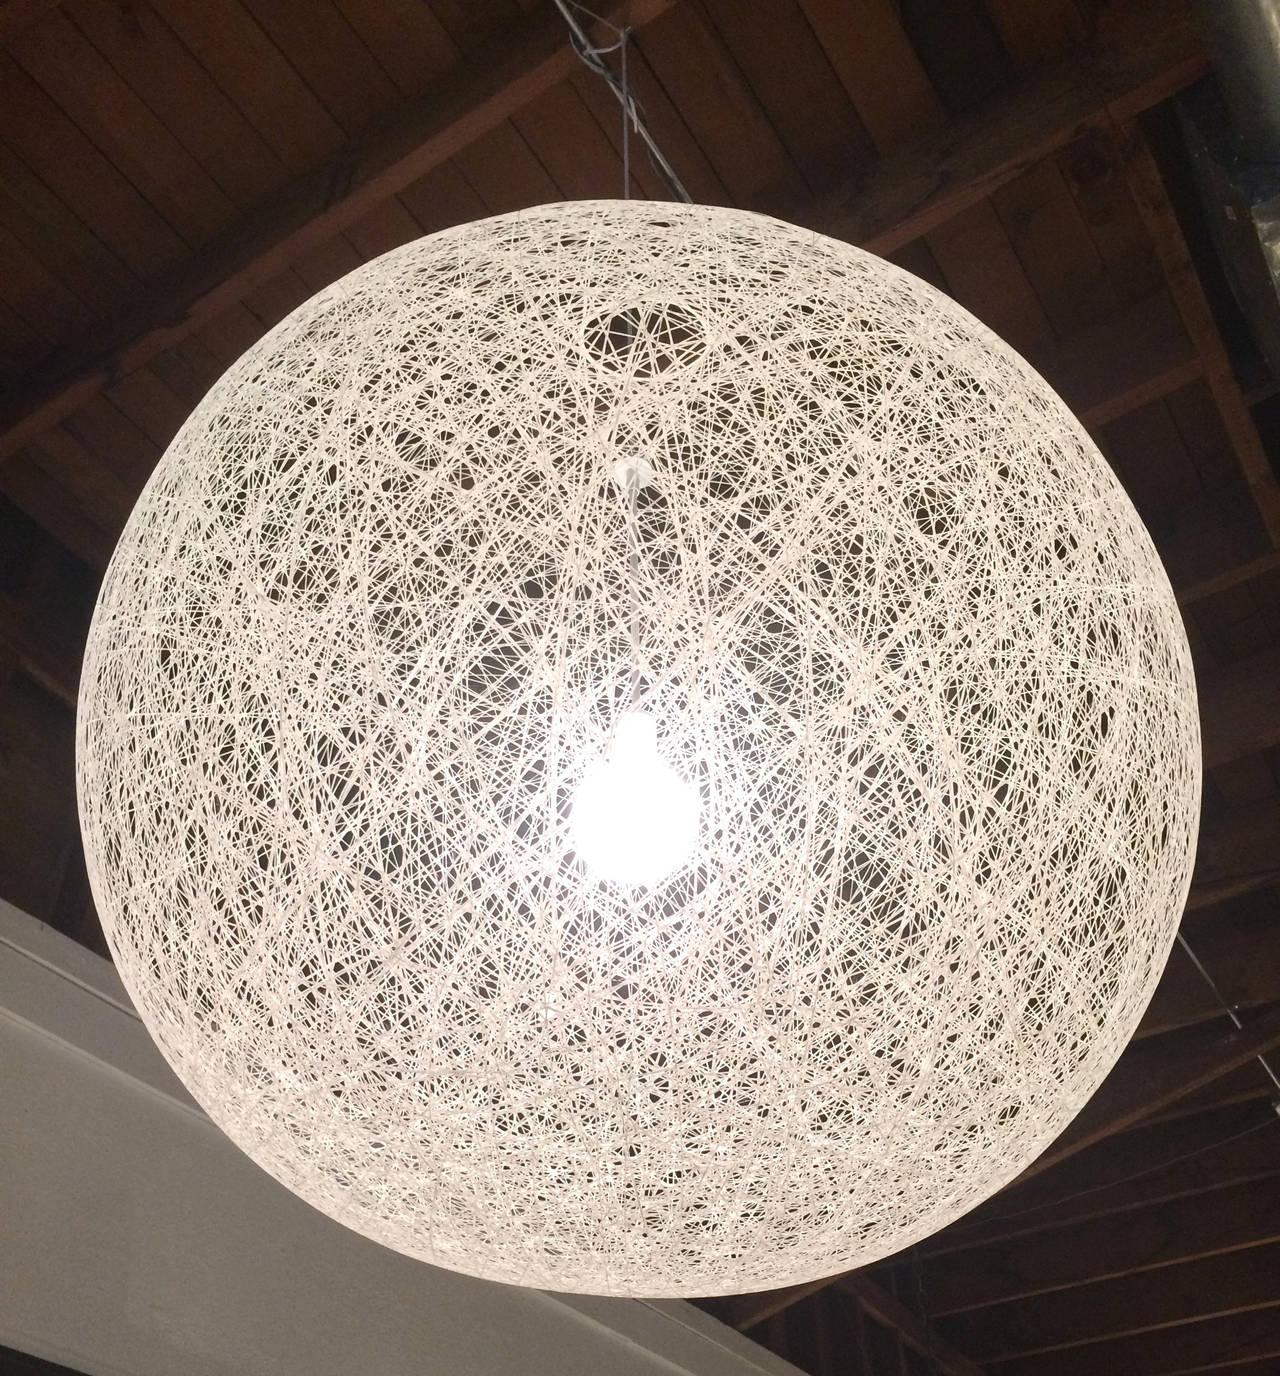 Spun Fiberglass Pendant By Bertjan Pot For Moooi At 1stdibs